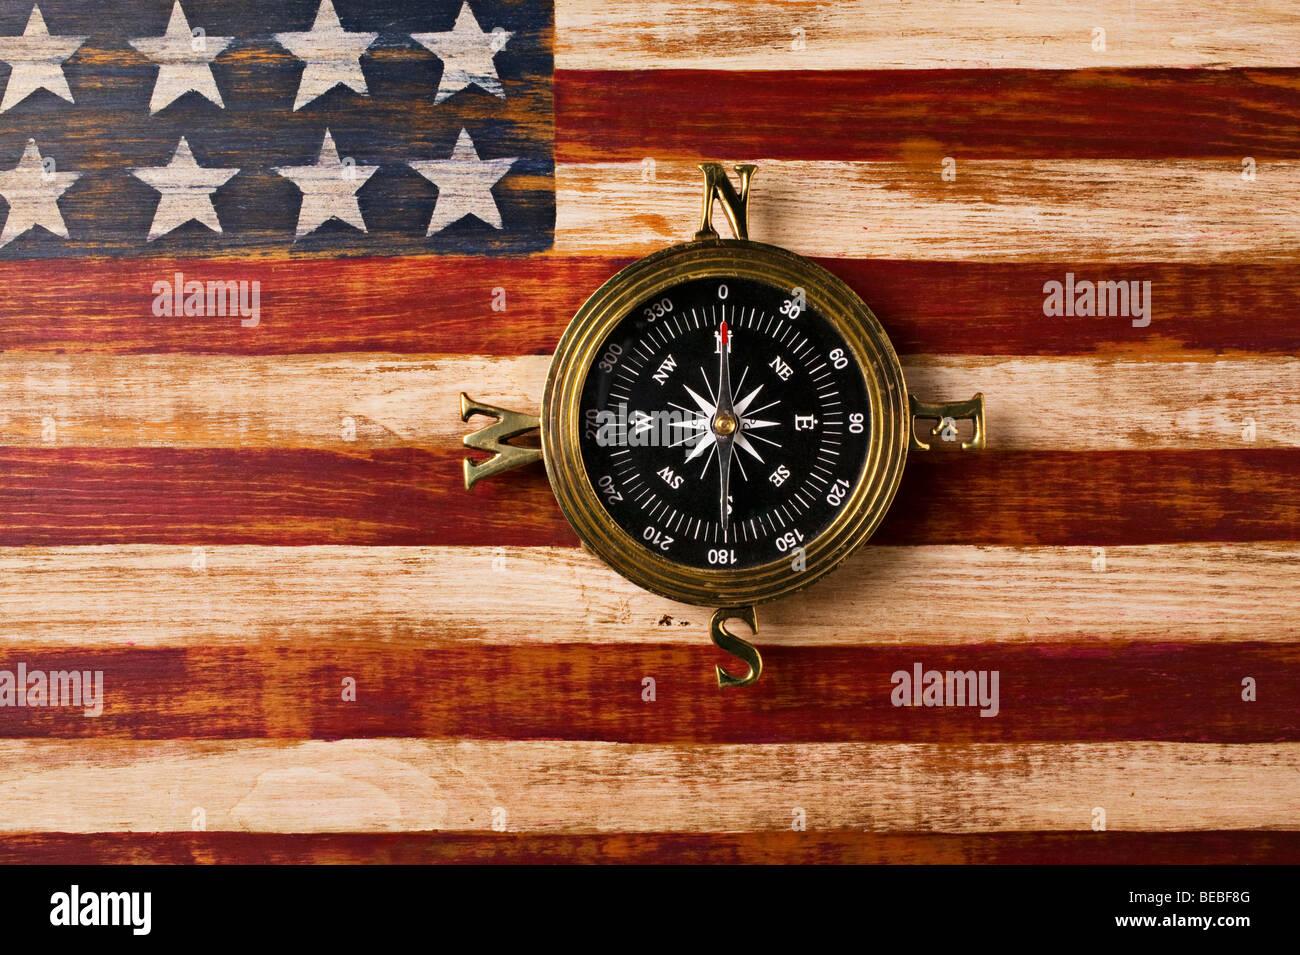 Compass on wooden folk art flag - Stock Image